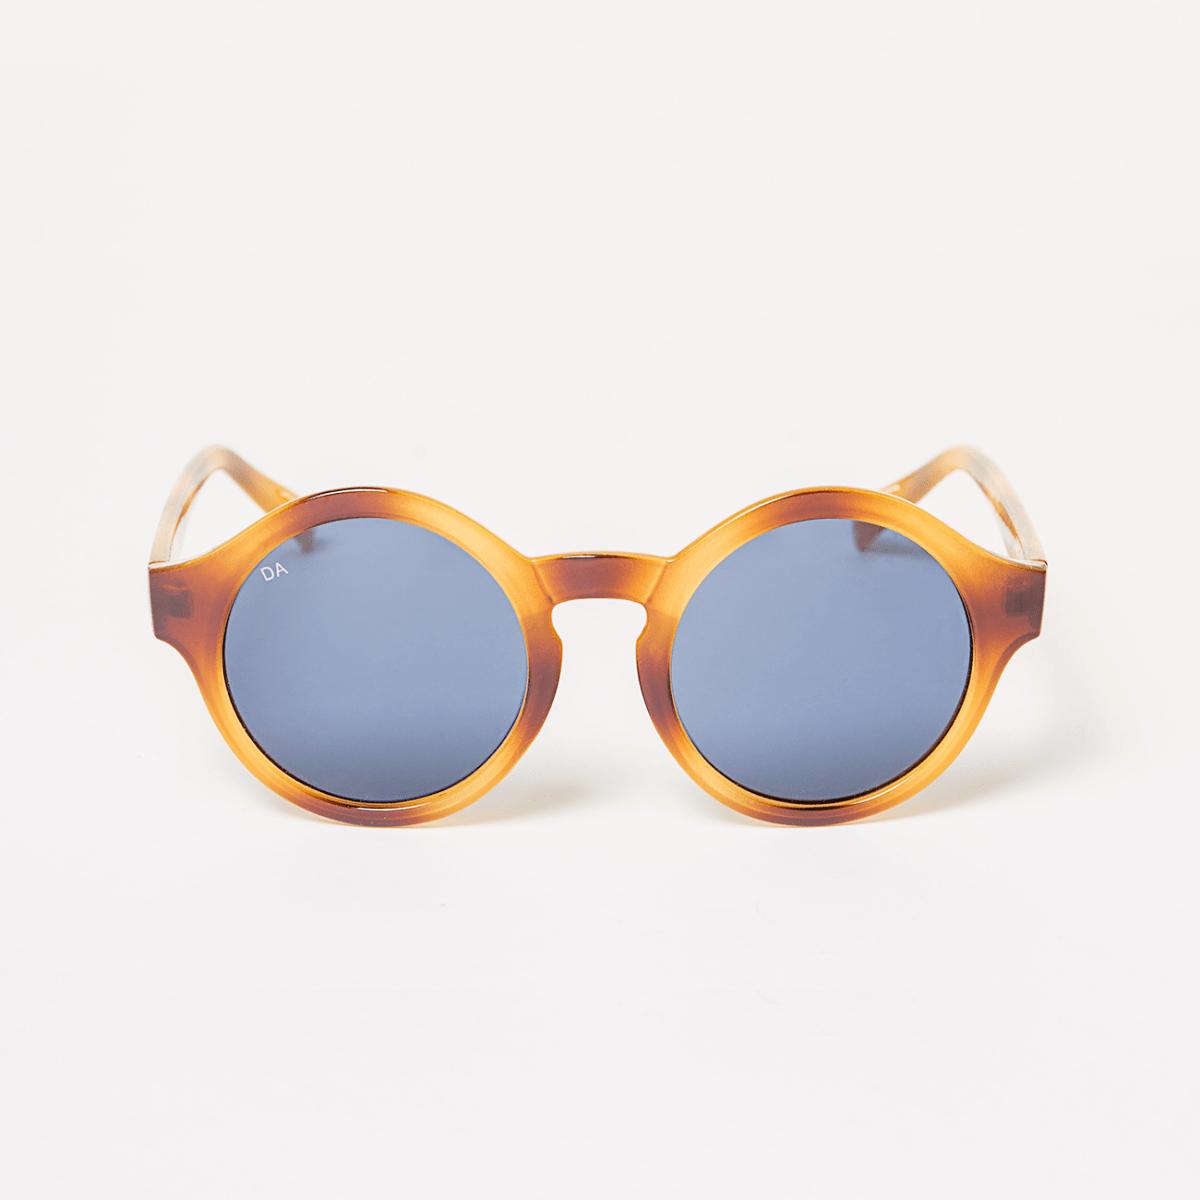 Kulaté brýle s modrými skly Double Agent